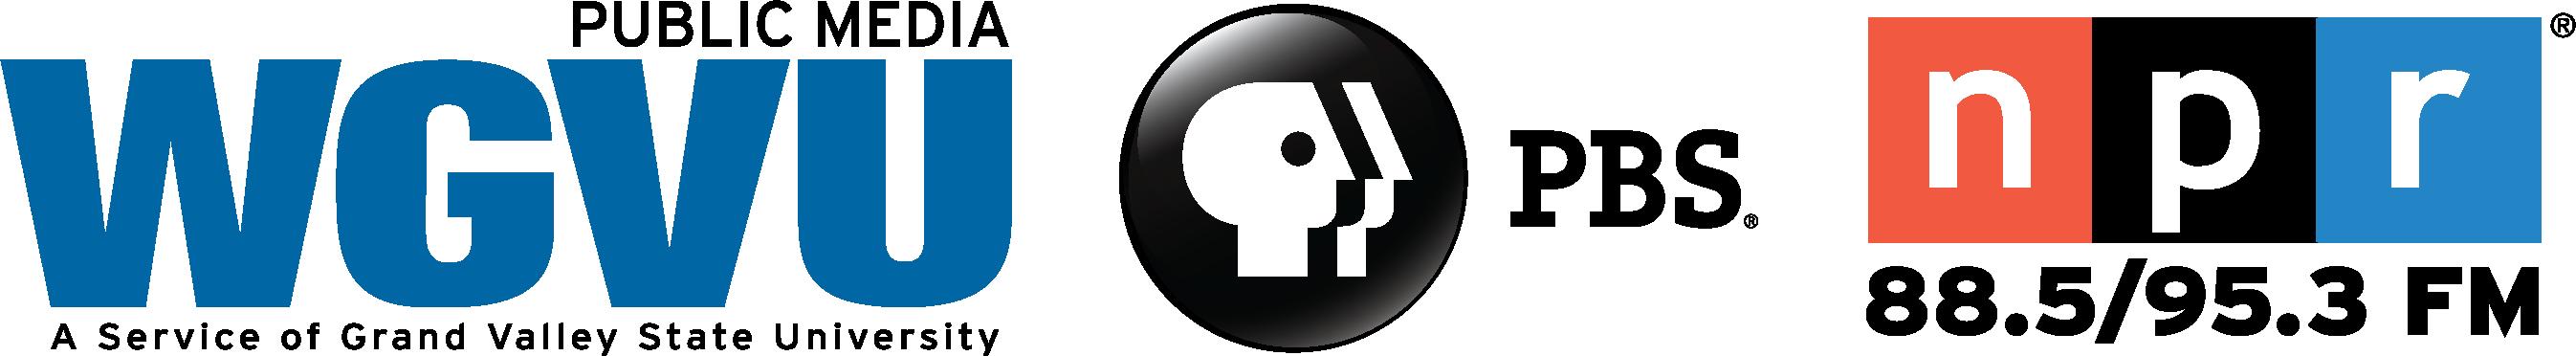 WGVU Public Media